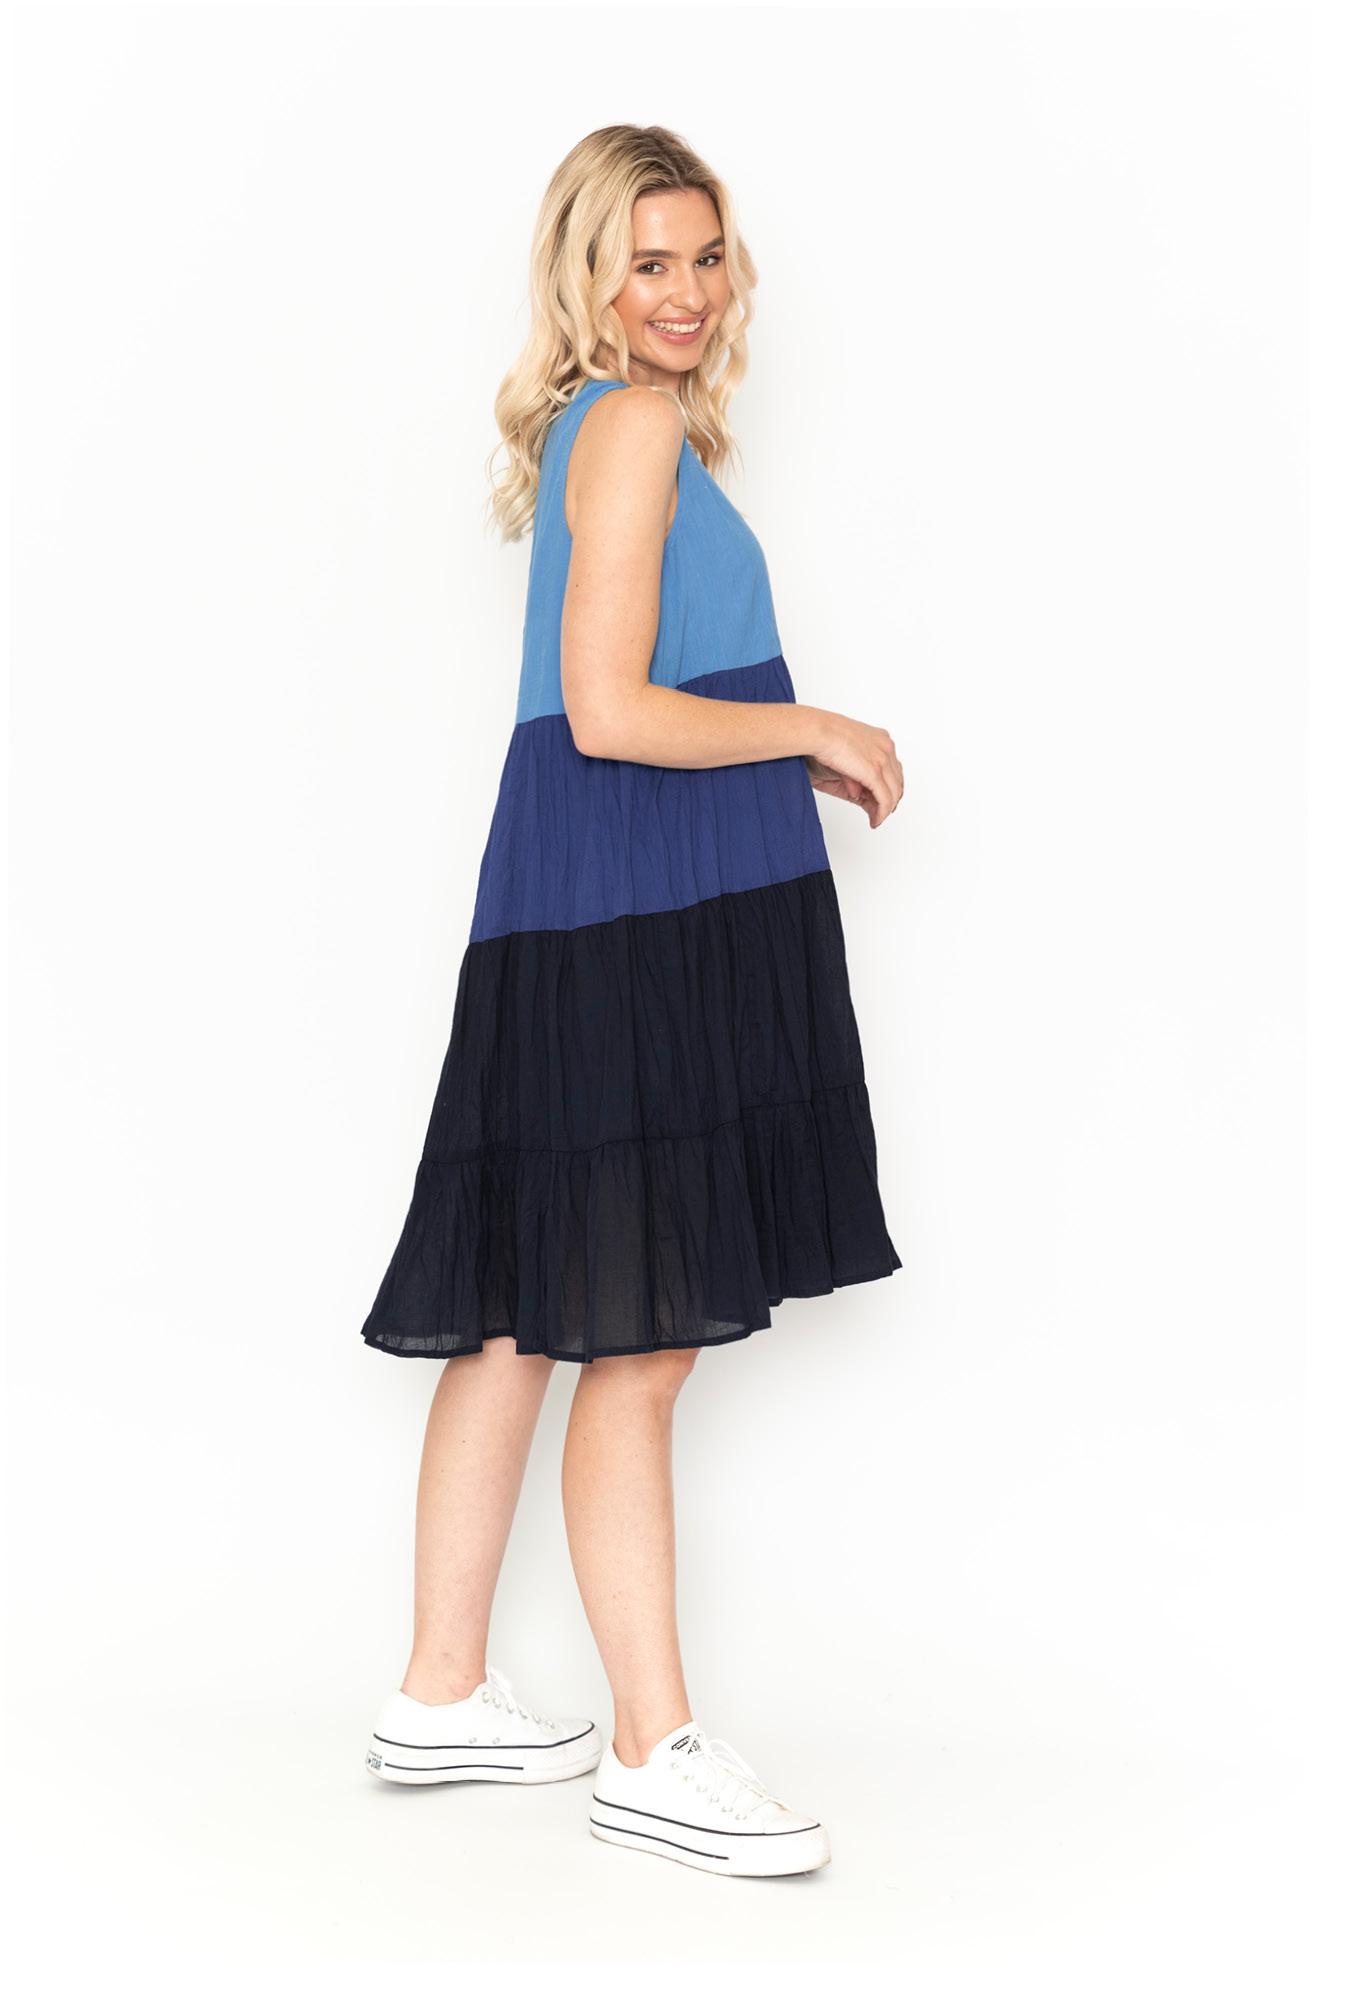 Stella Ombre Dress in Navy